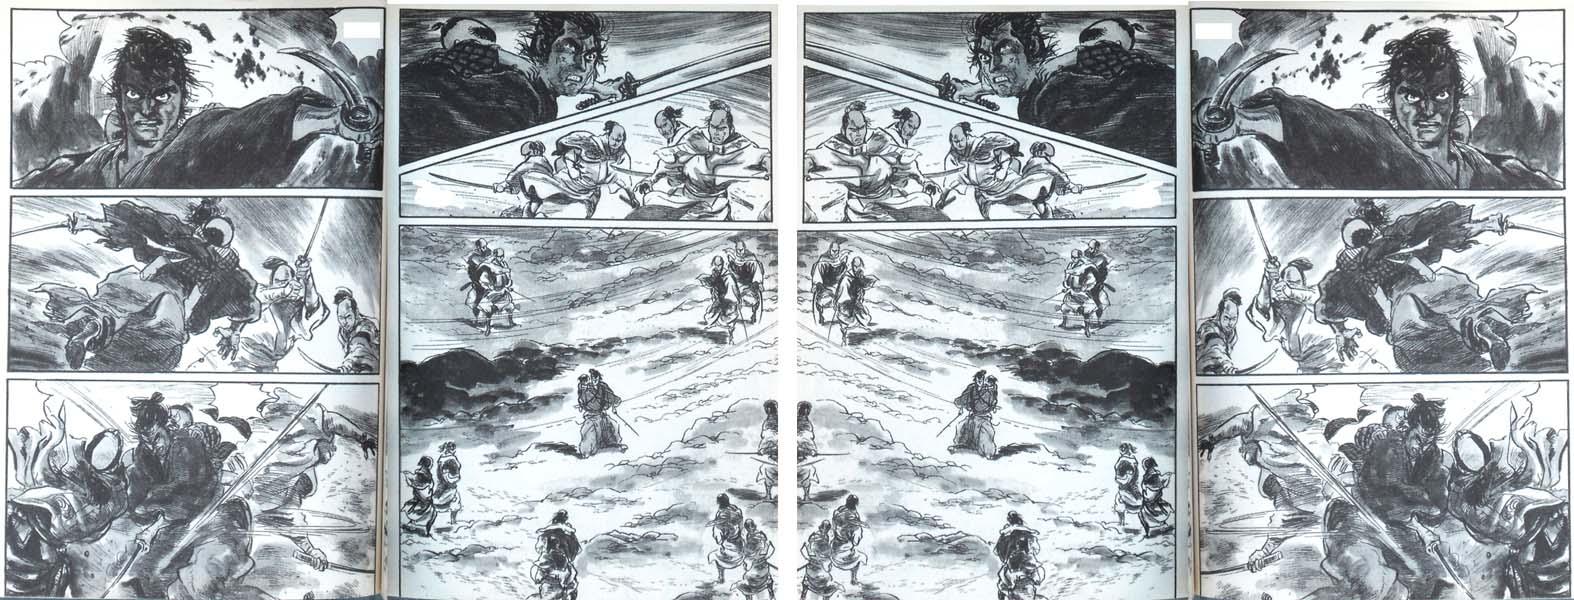 Kazuo Koike e Goseki Kojima, Kozure Okami / Lone Wolf and Cub